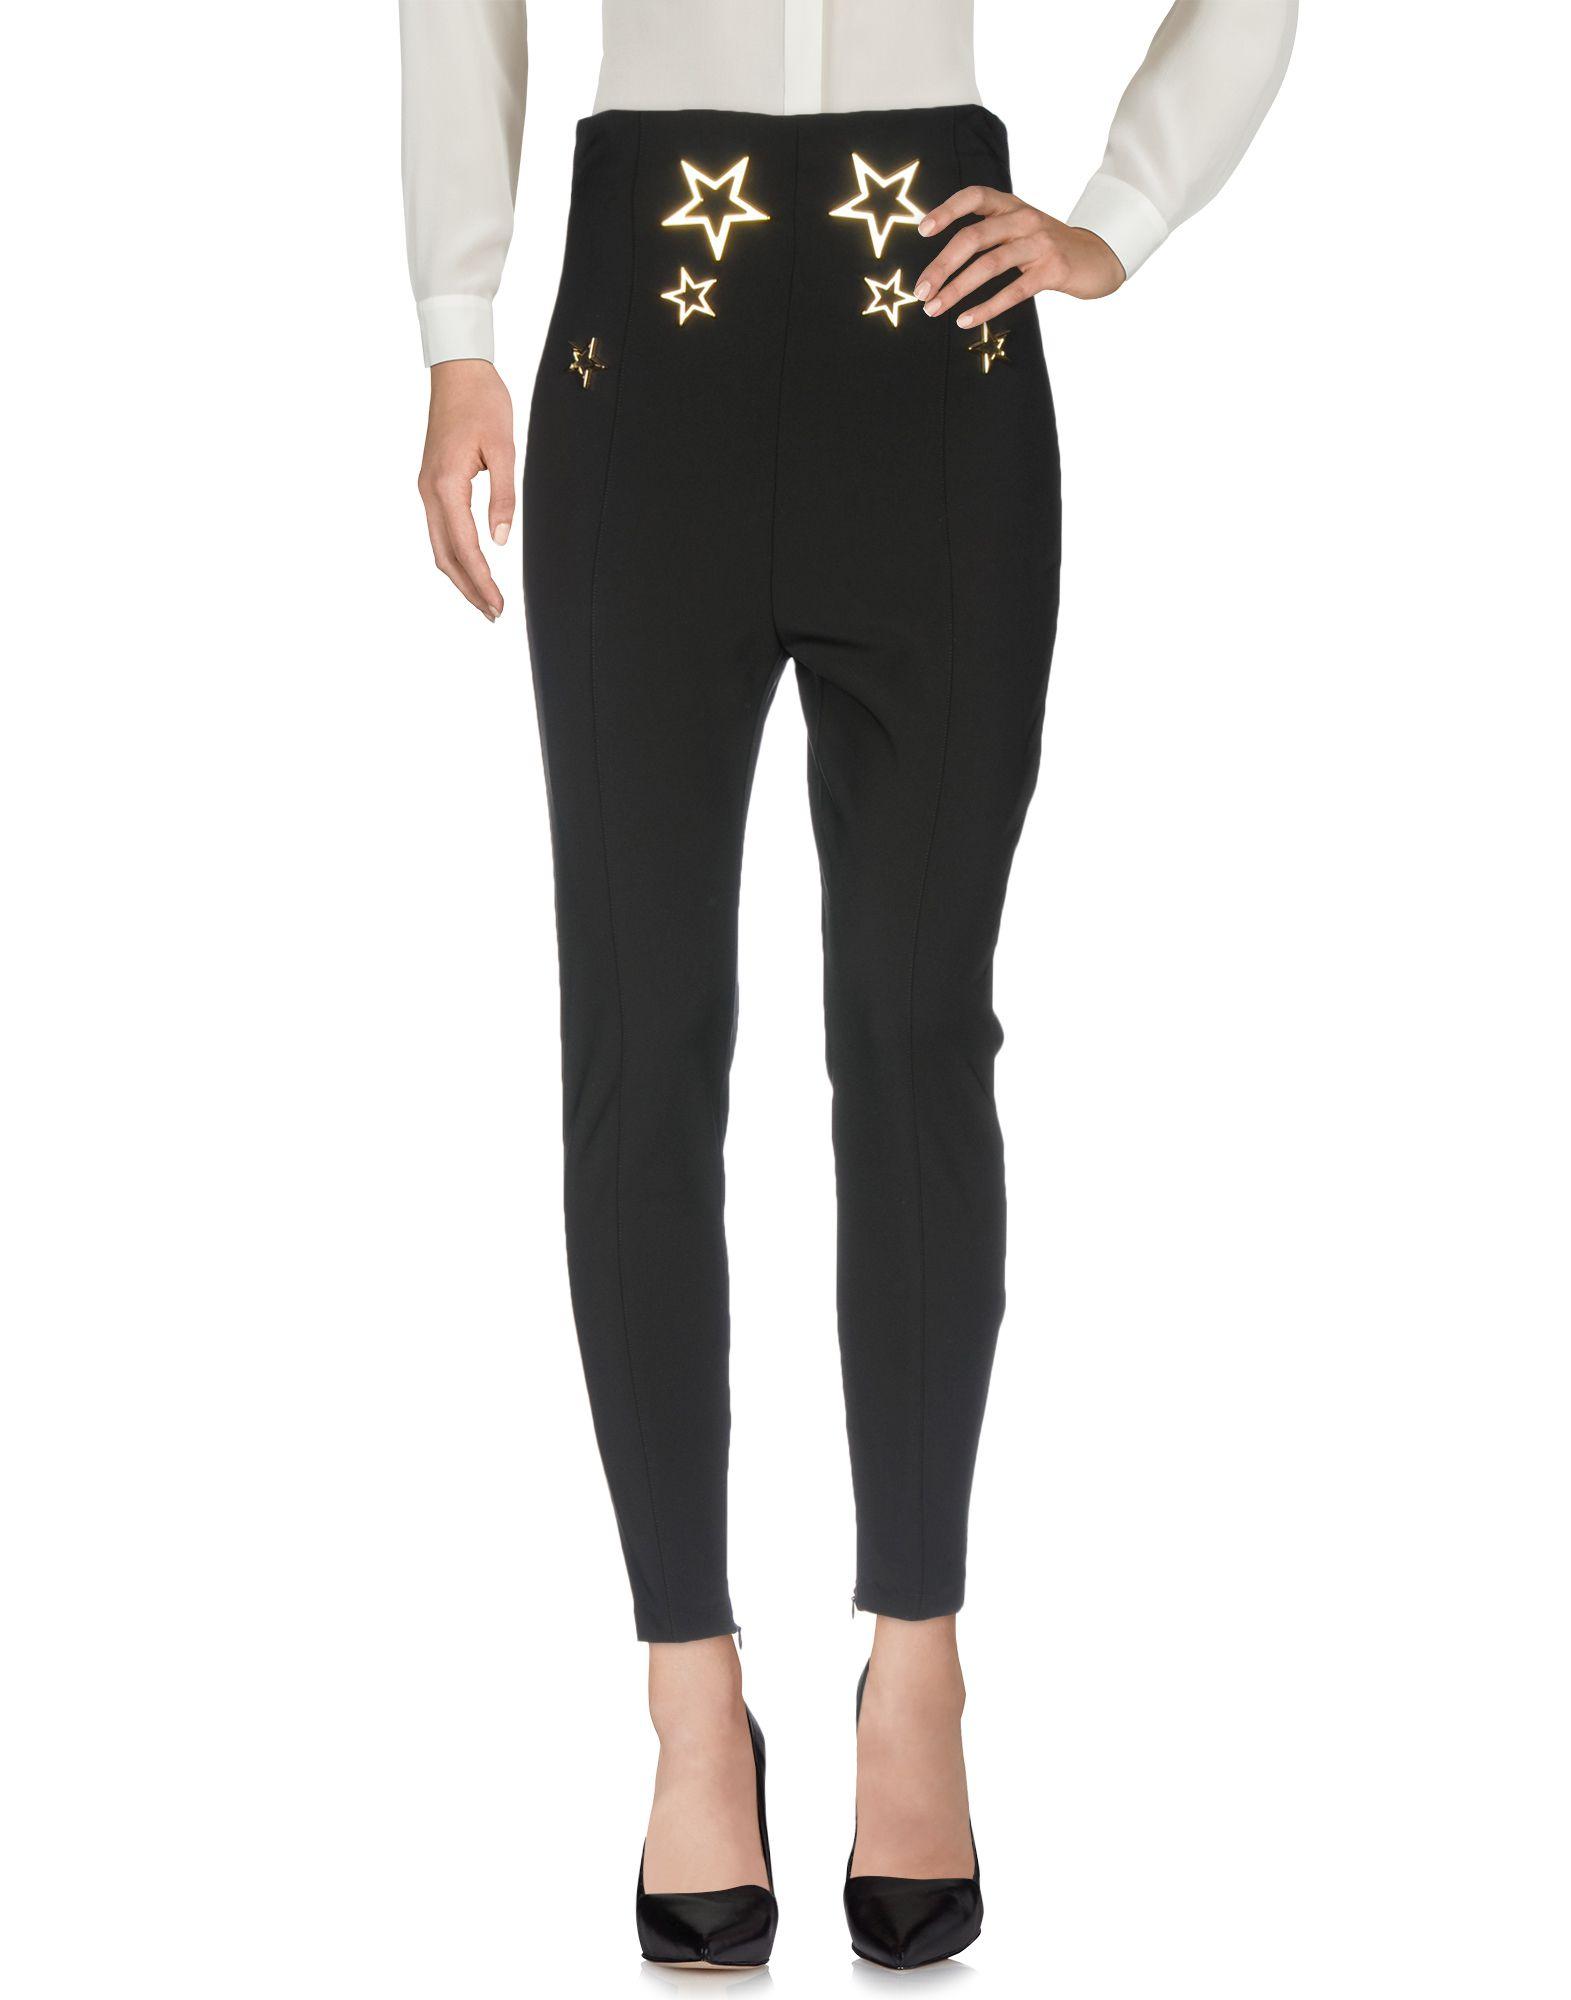 Pantalone Elisabetta Elisabetta Fran  donna - 13181945NQ  80% Rabatt